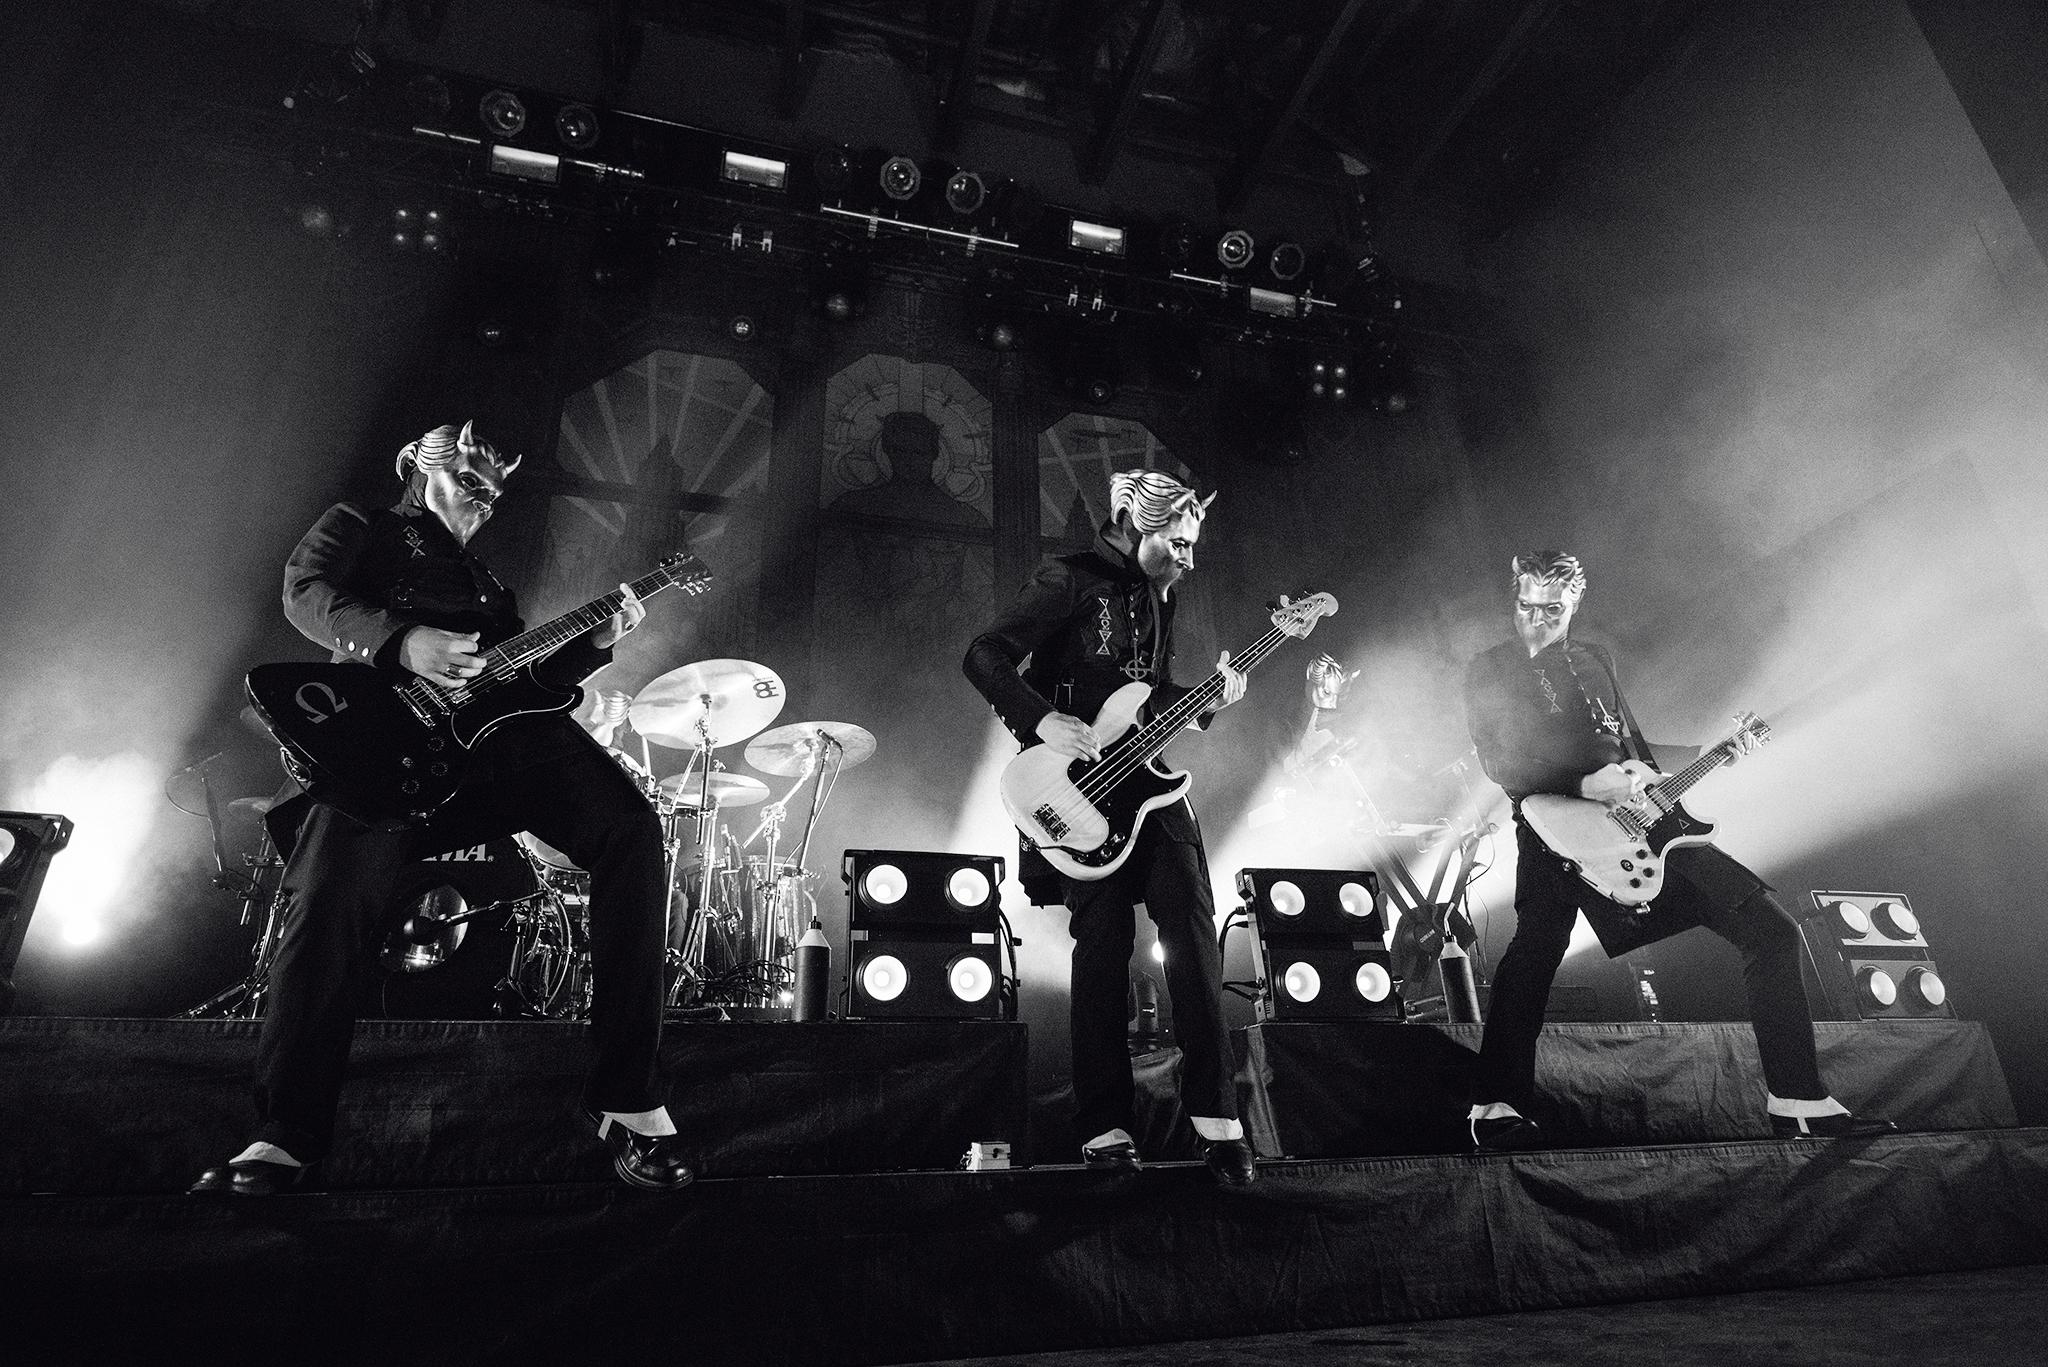 Ghost-Emos-Concert-Photography-Katrina-Barber-3.jpg